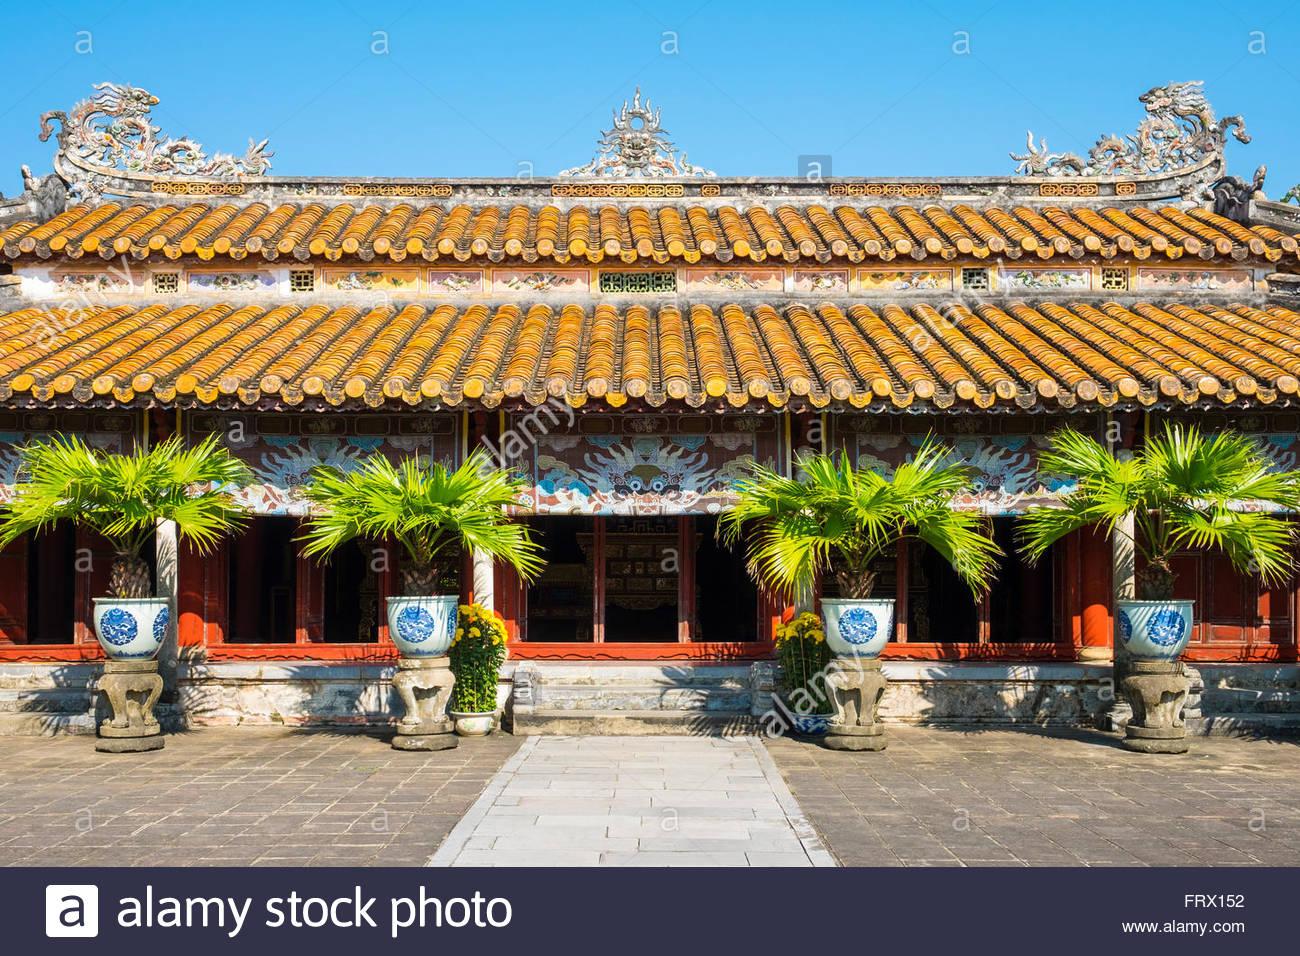 Hung Mieu templo dentro del complejo del templo Mieu a, la Ciudad Imperial de Hué, provincia de Thua Thien Imagen De Stock